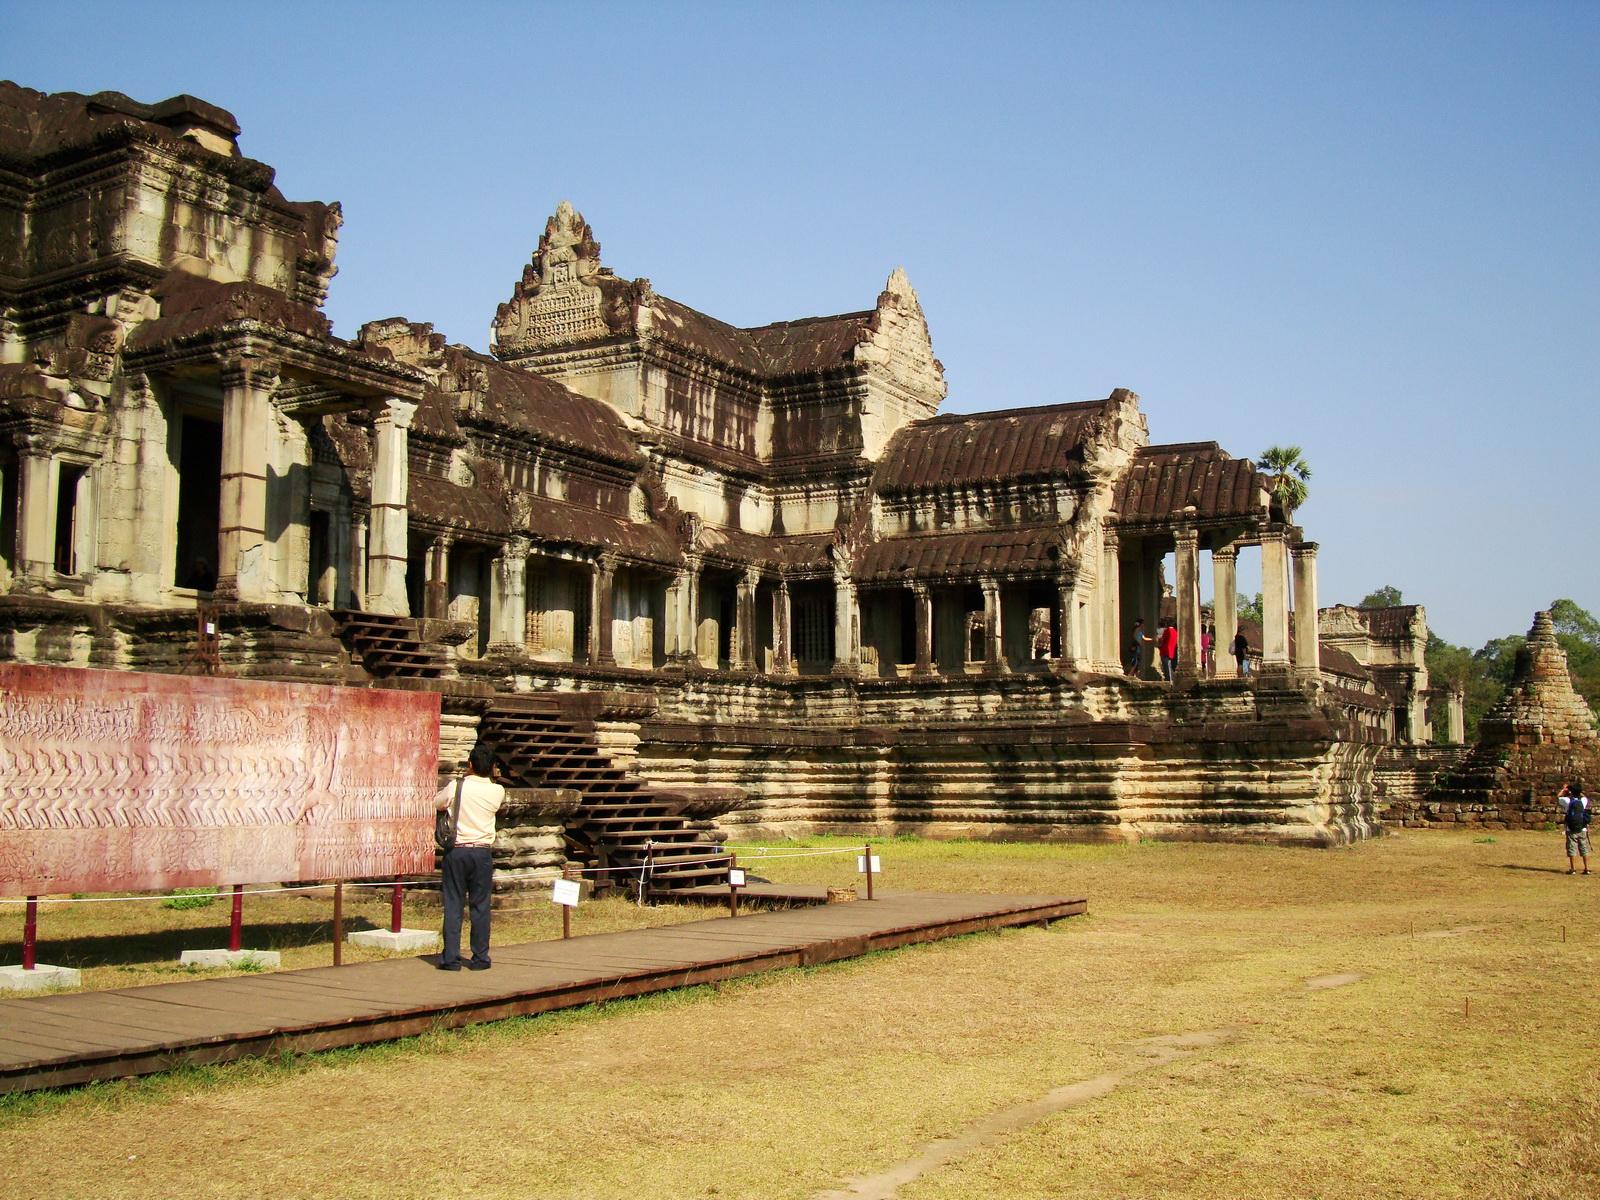 1 Angkor Wat notice board Churning of the sea of milk 0E